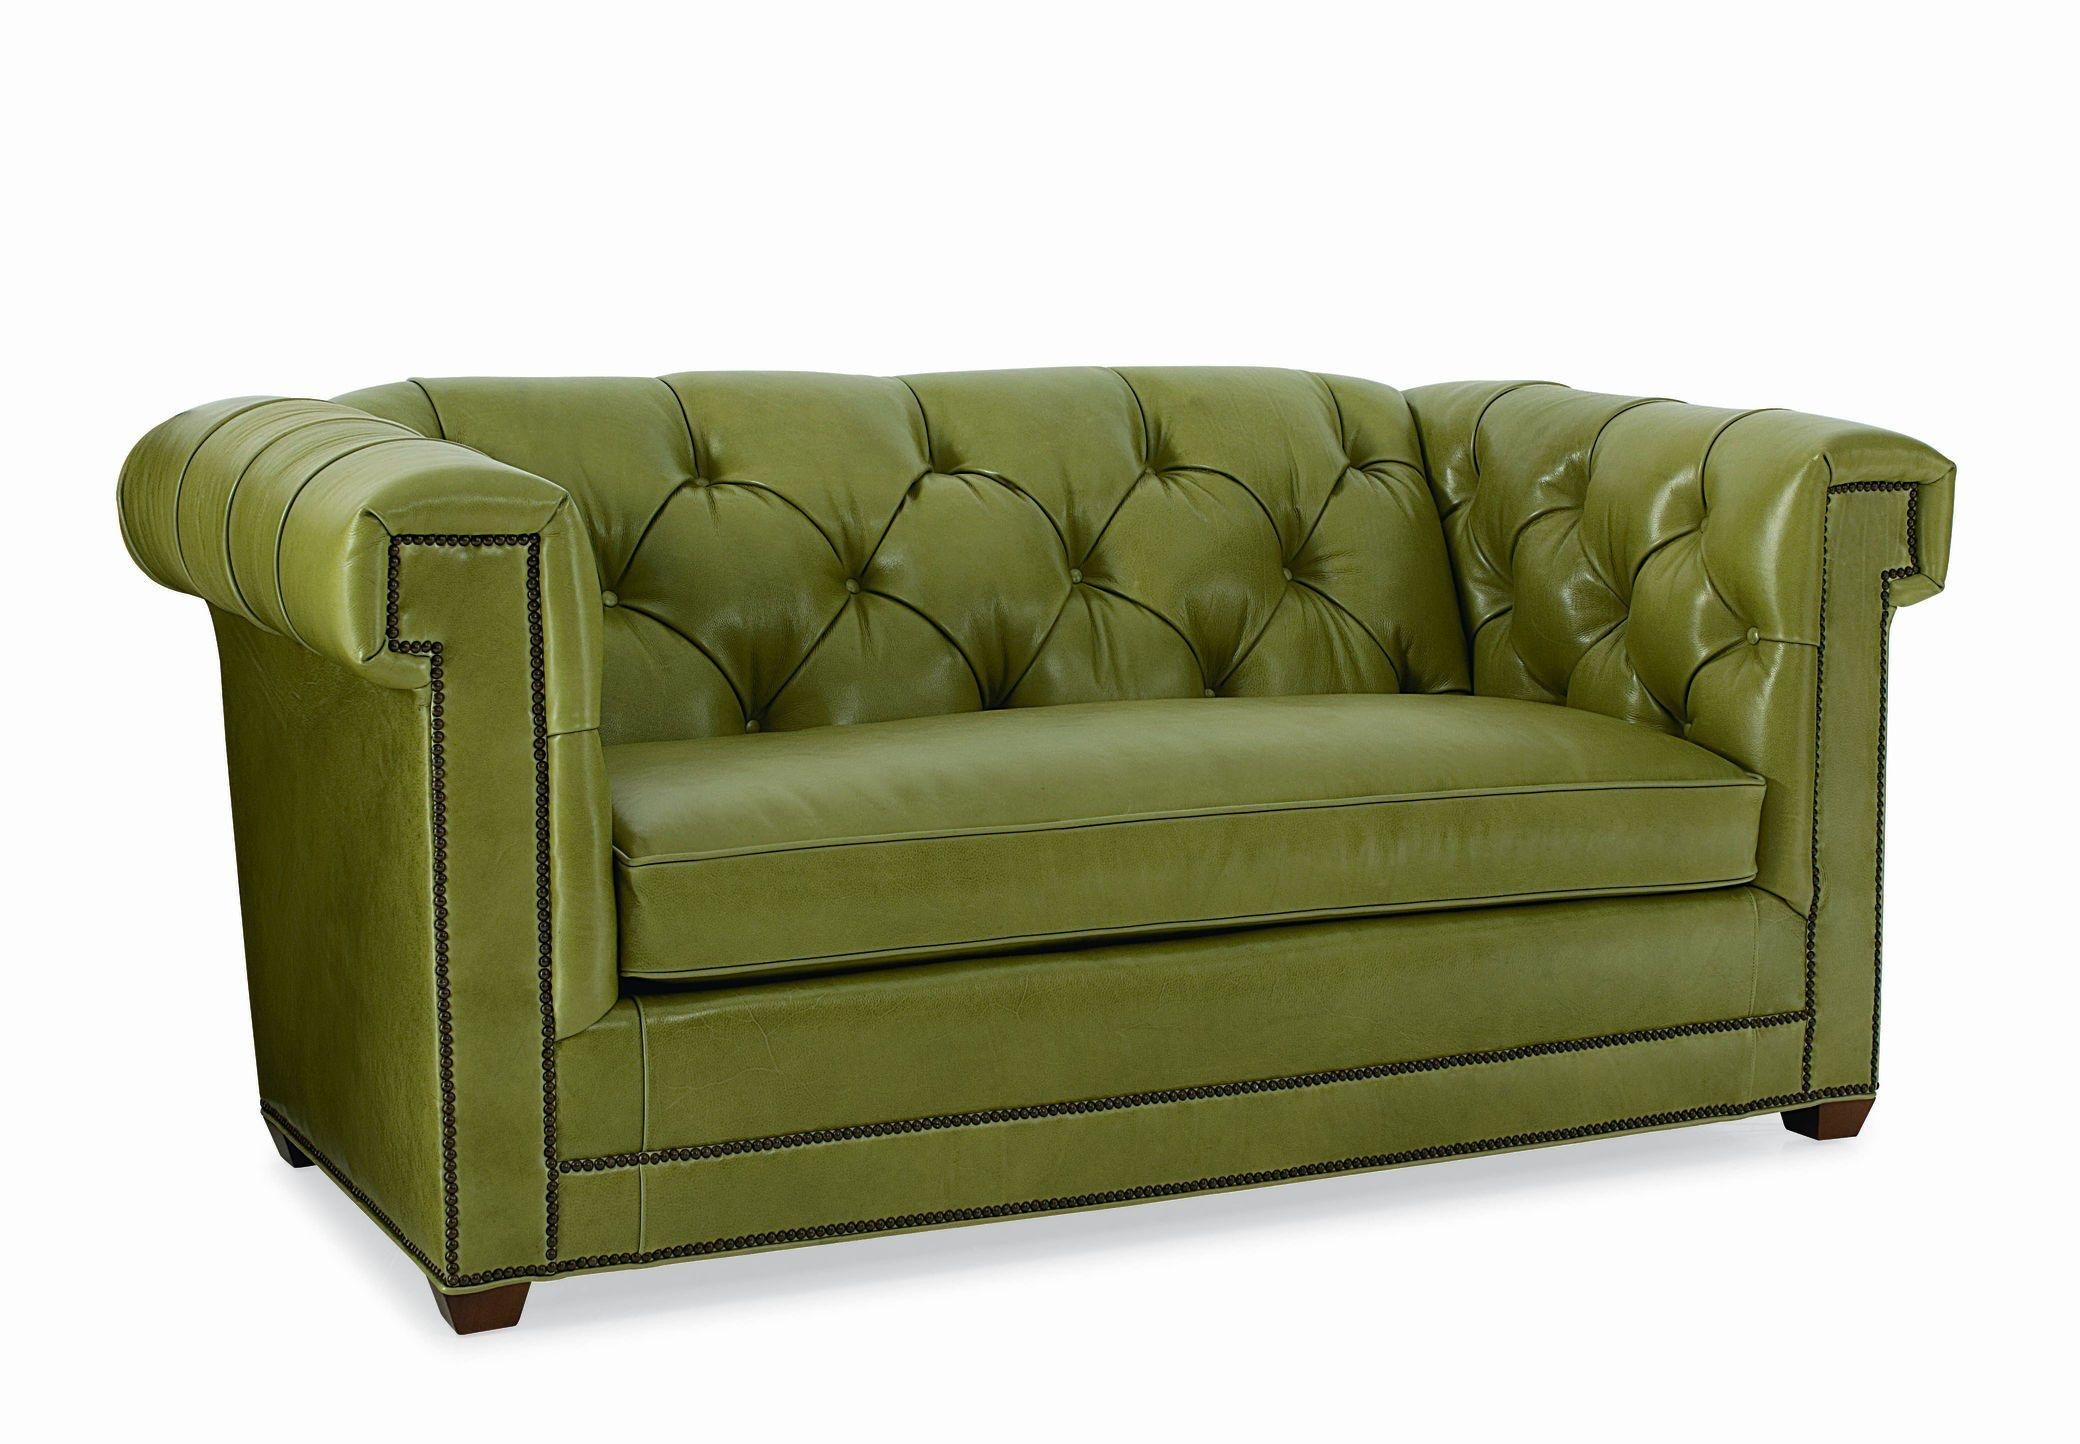 schnadig sofa 9090 2 seater l shaped thomasville living room ella 1718 11 whitley